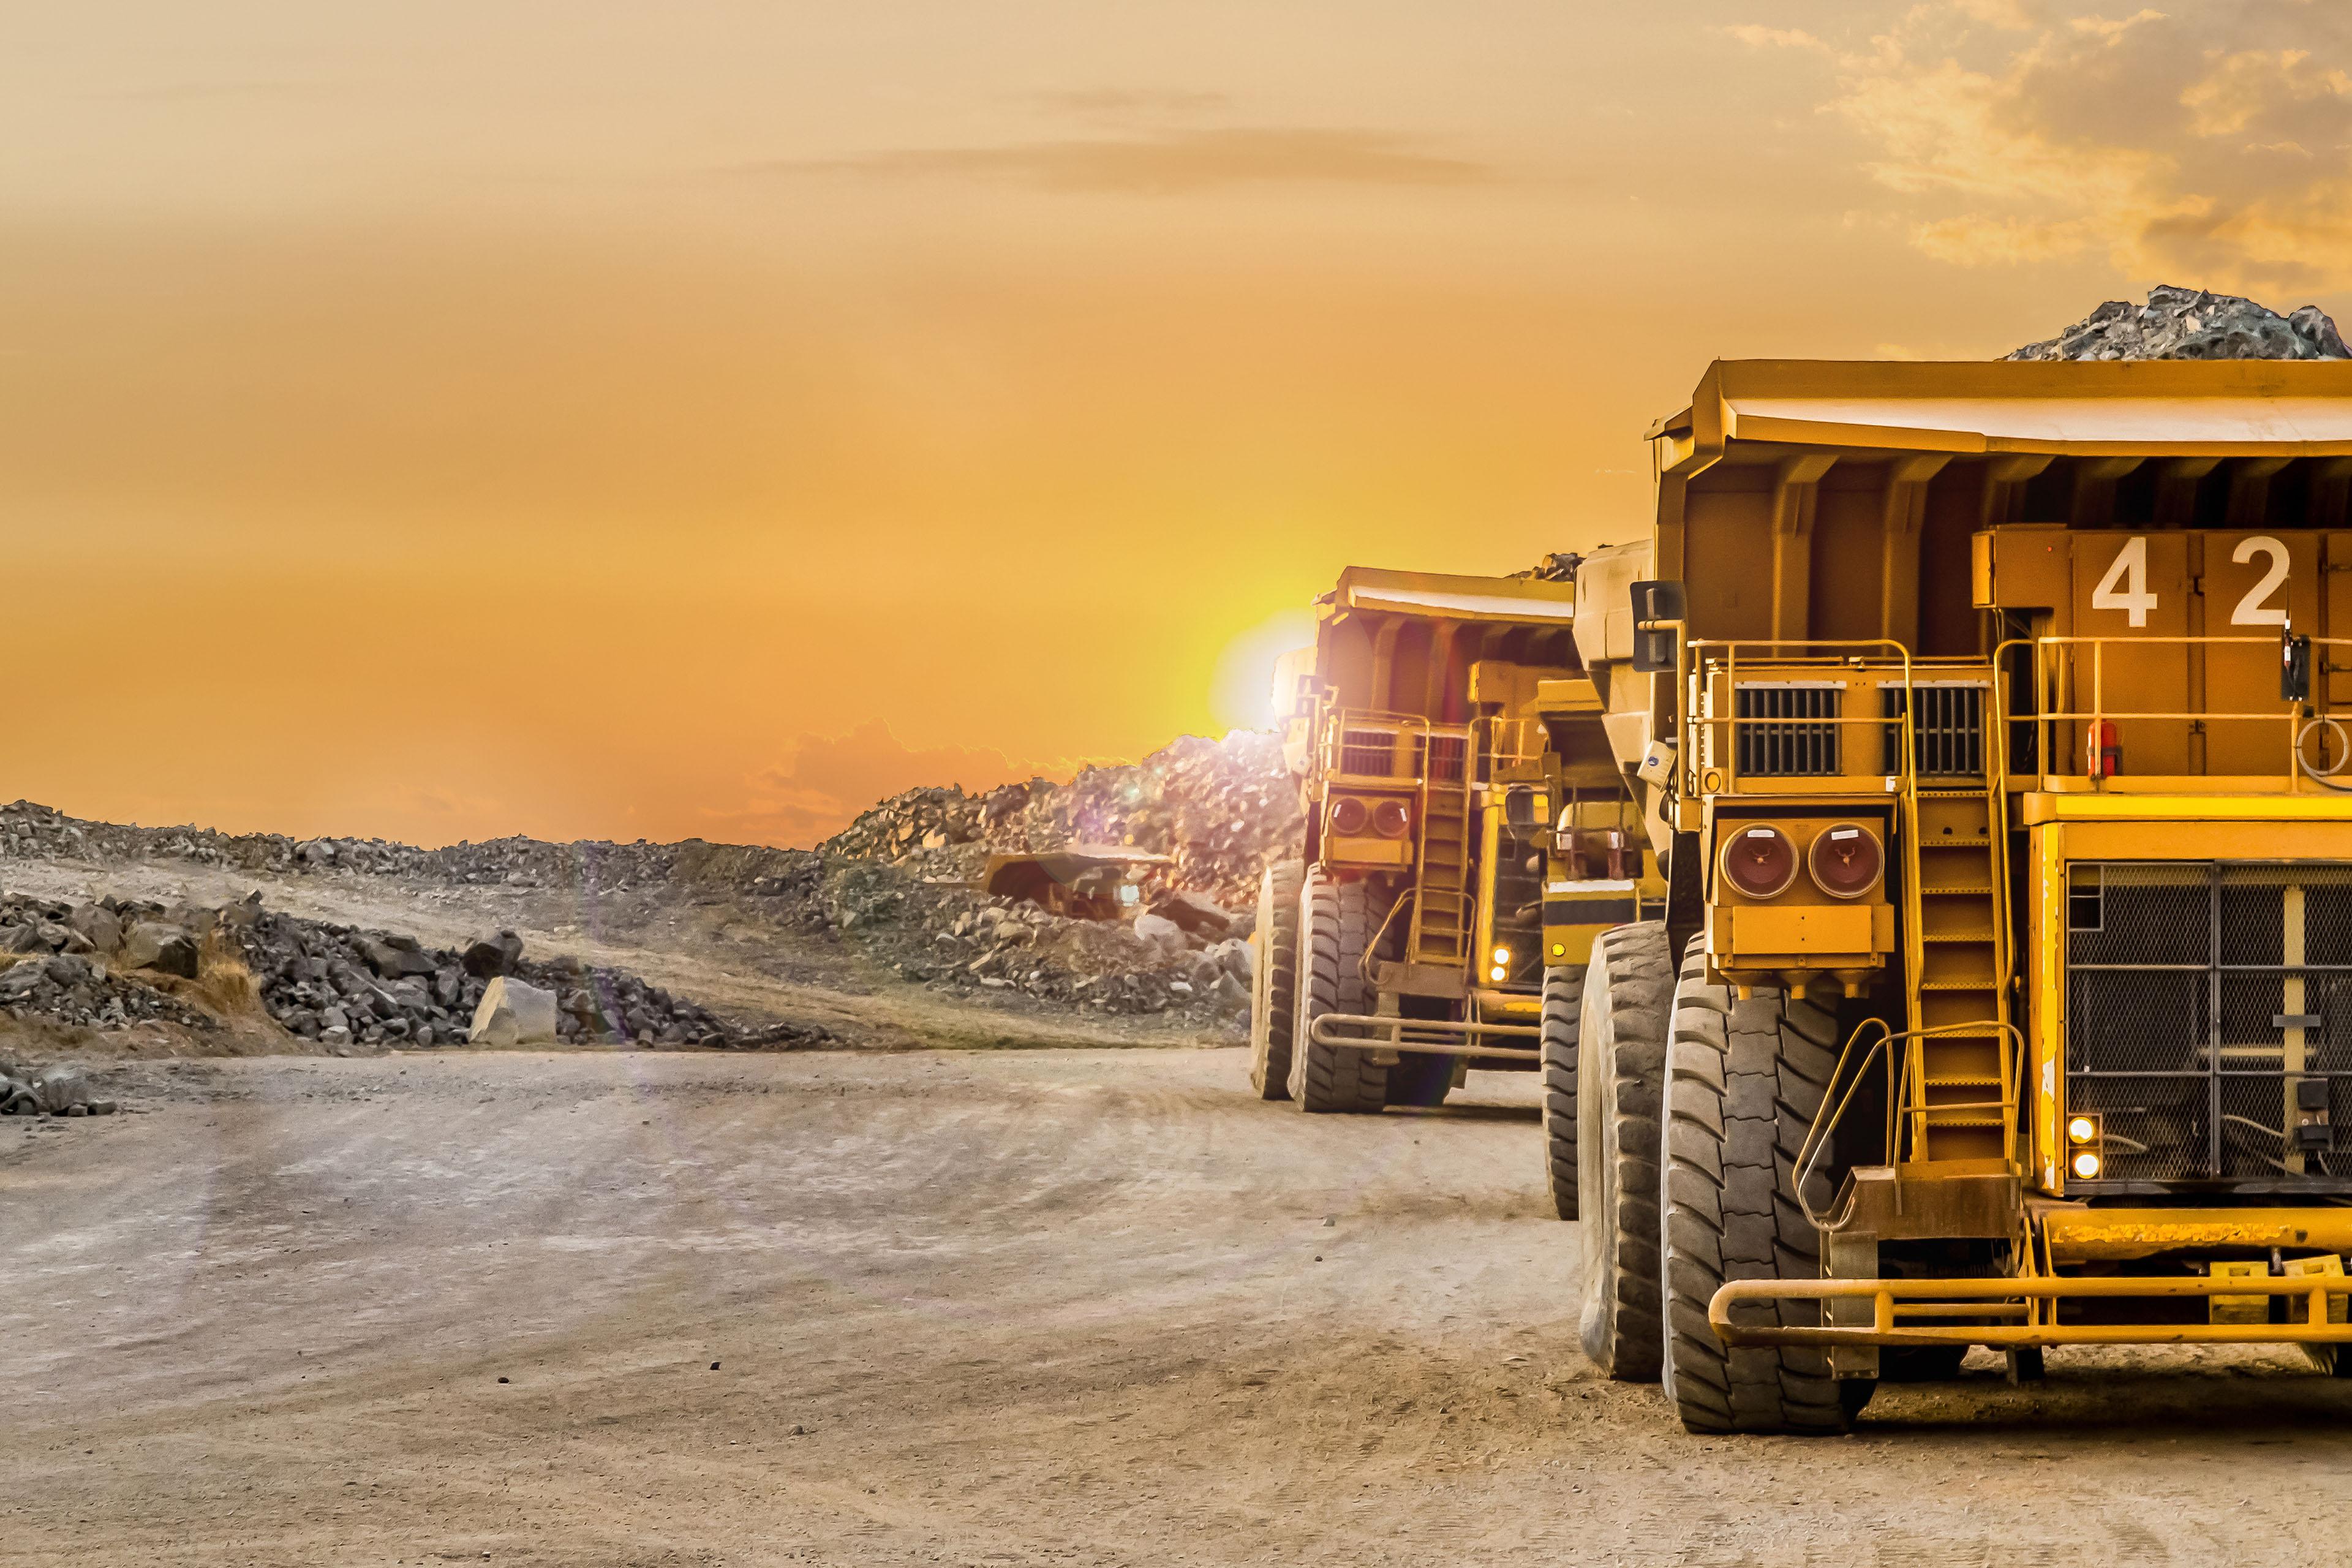 Ey - Oversized mining dump trucks